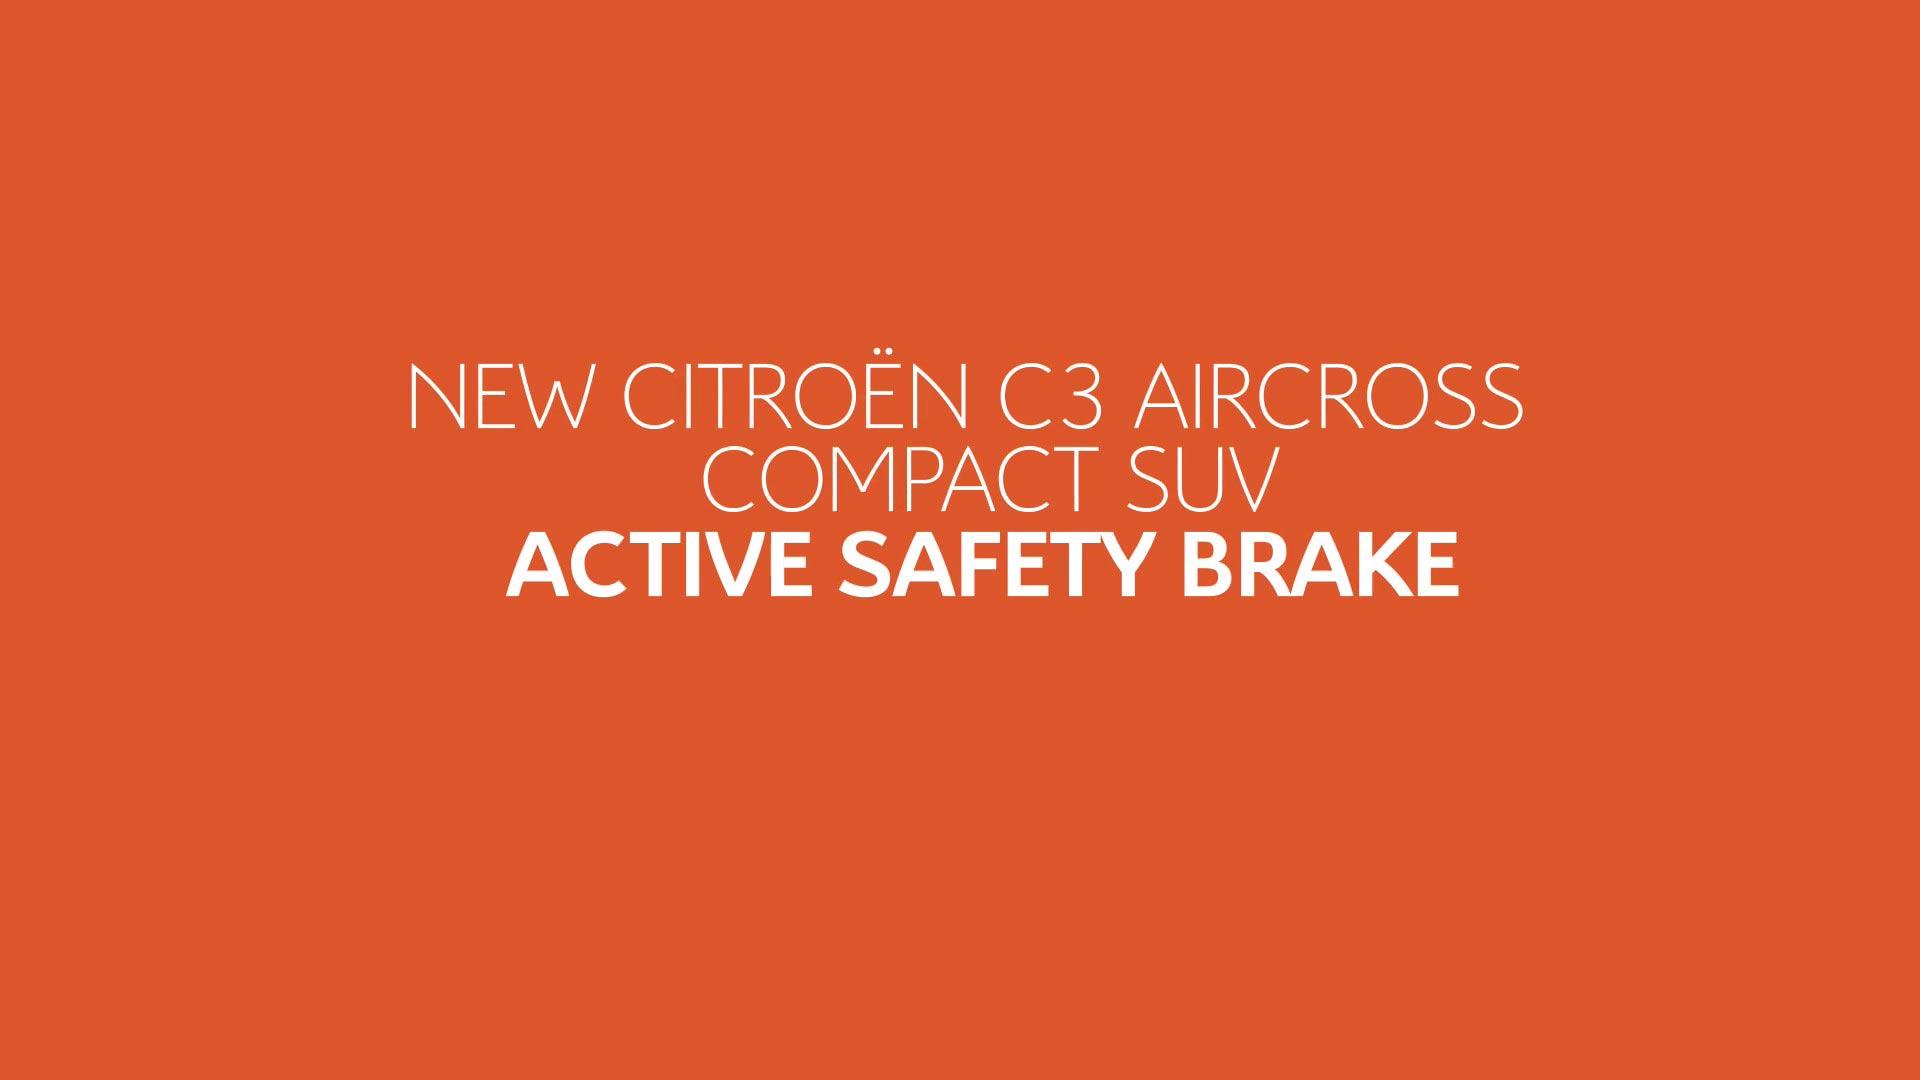 Citroën C3 Aircross SUV Tutorial Videos - Active Safety Brake